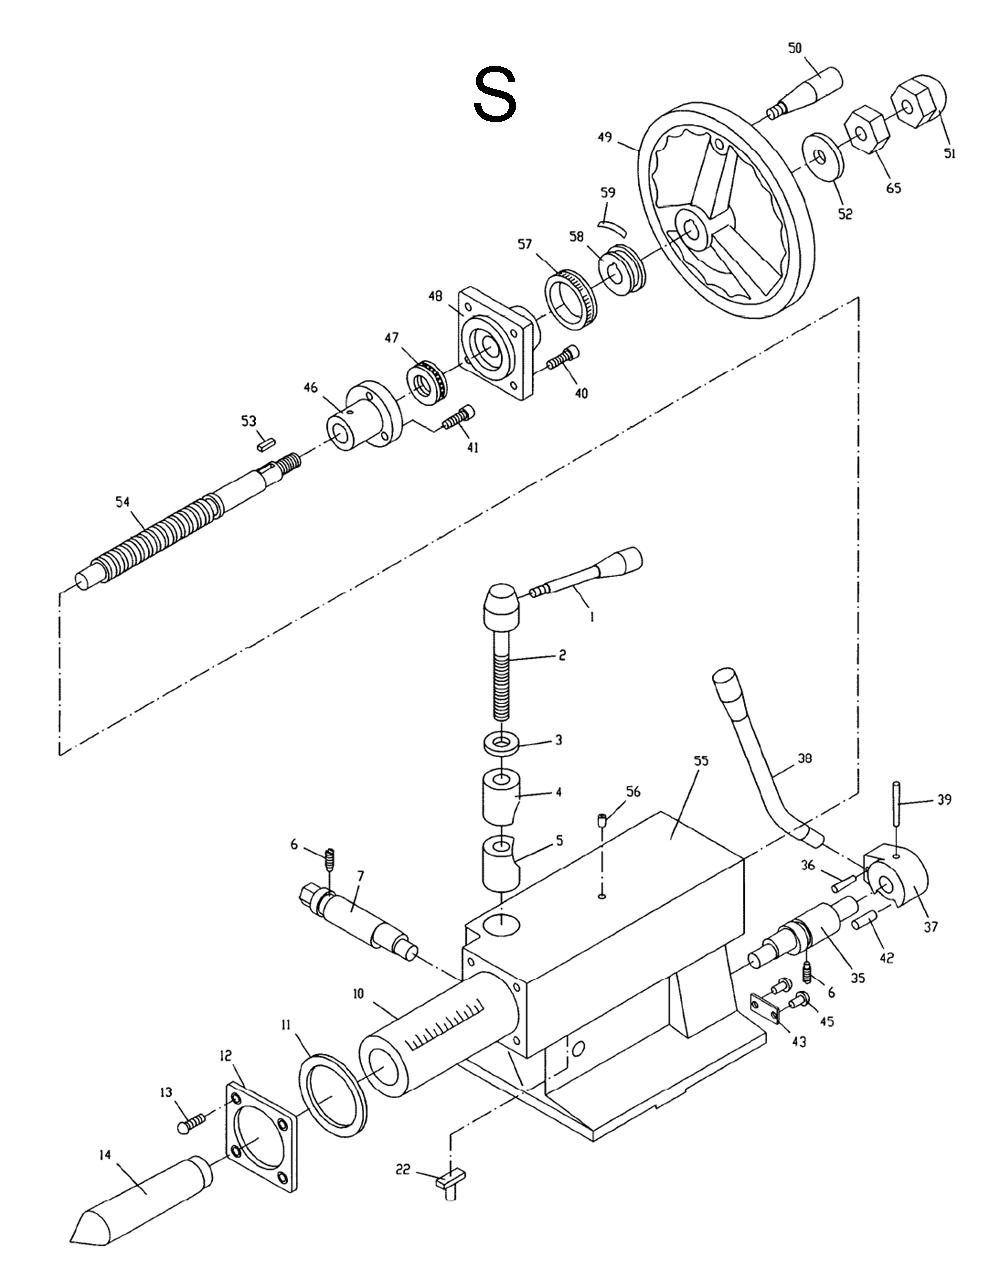 321312-jet-PB-19Break Down